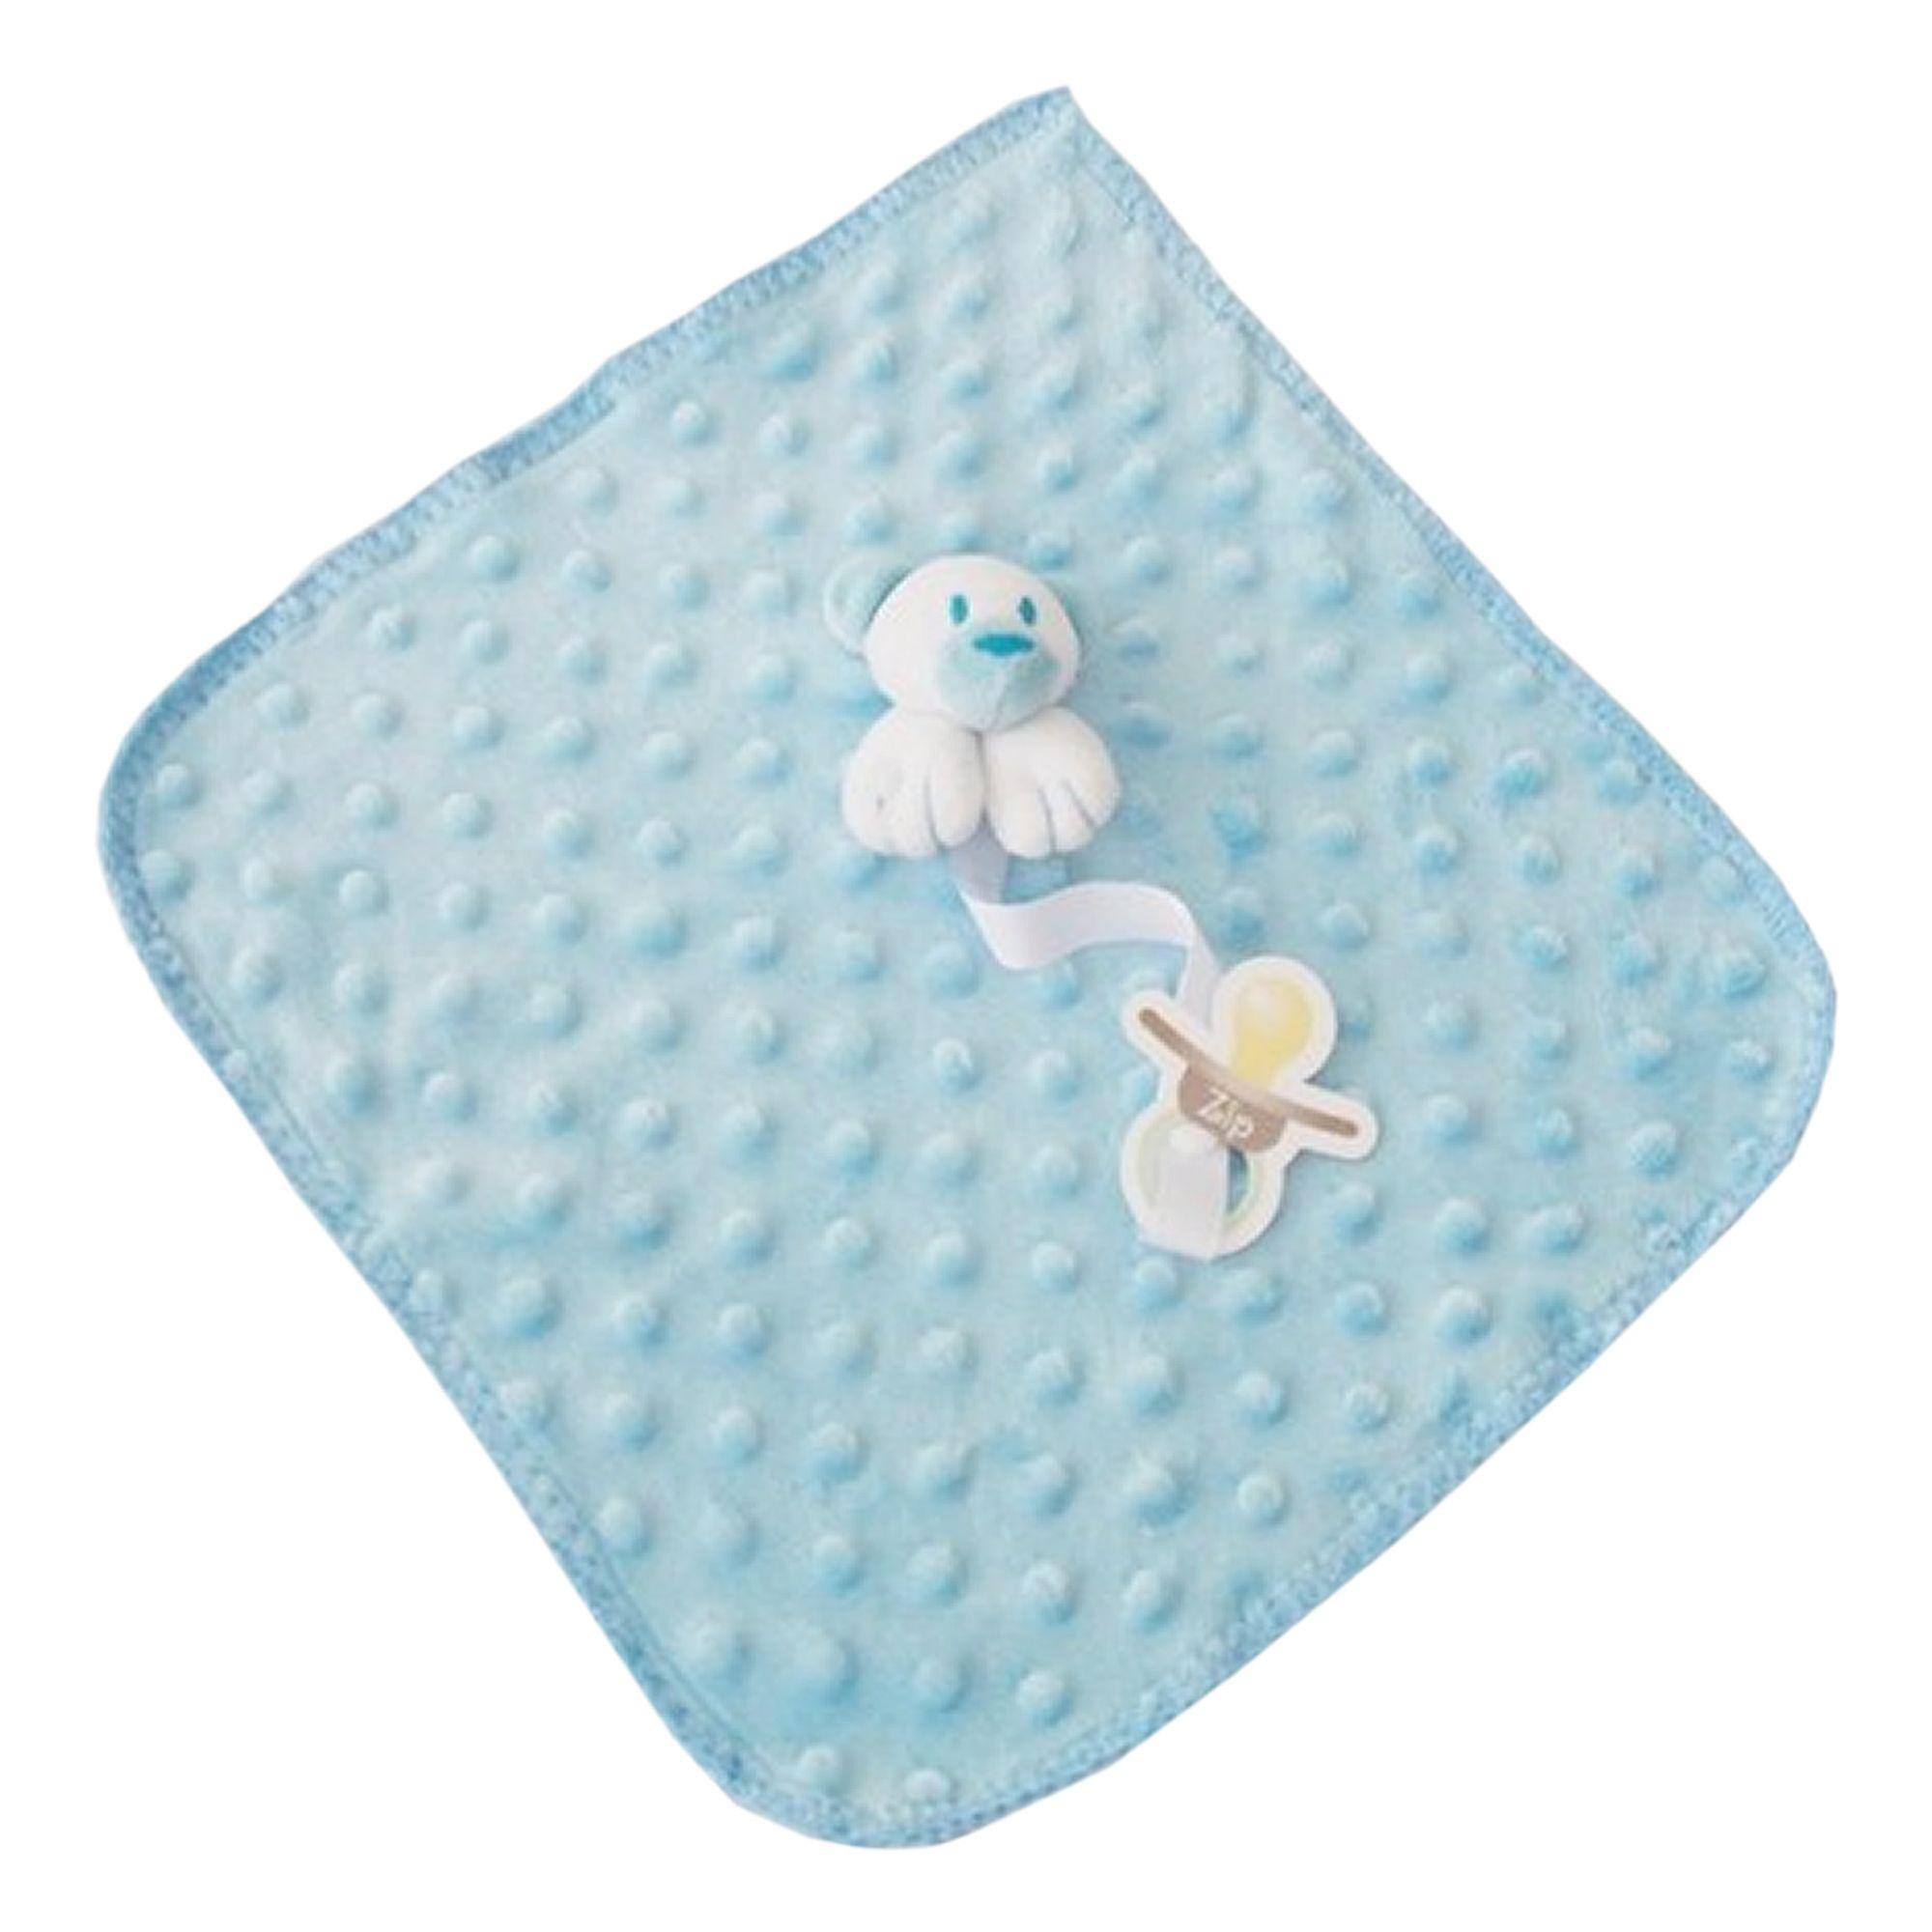 blanket-cetim-baby-ursinho-azul-bolhas-com-prendedor-chupeta-zip-toys